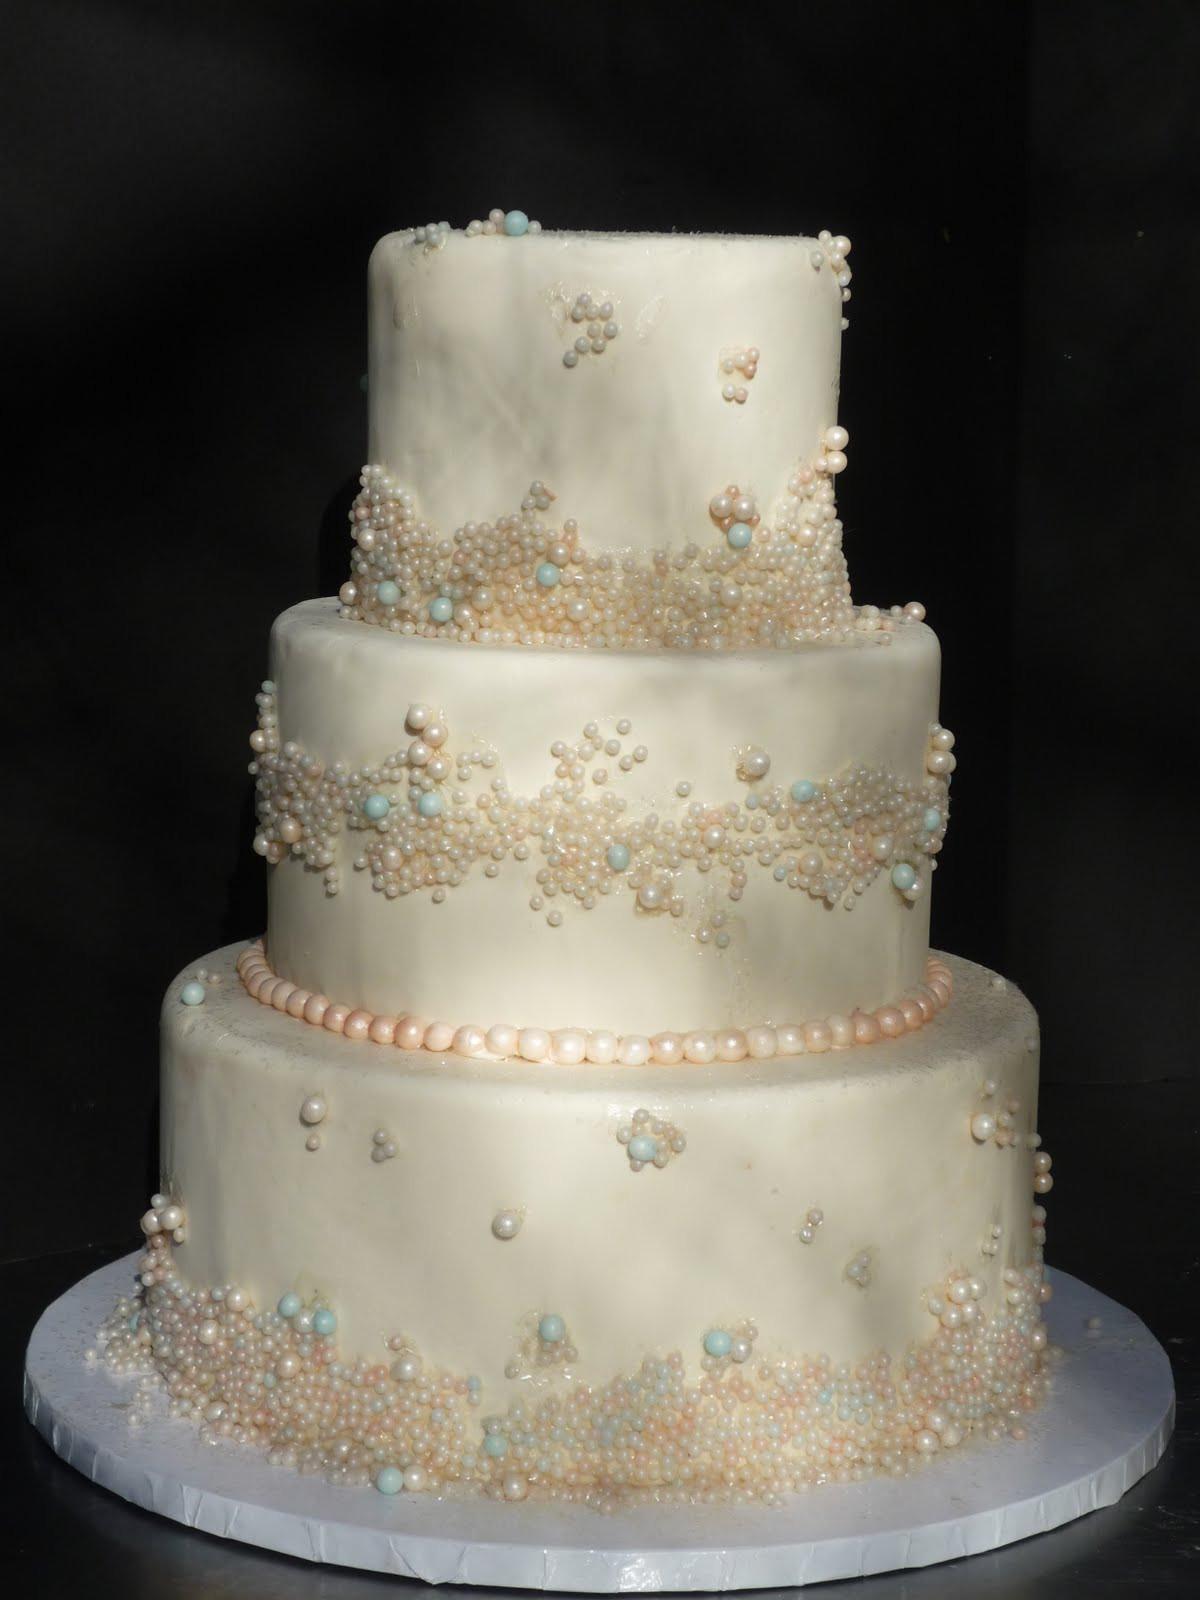 Fondant Wedding Cakes  Artisan Bake Shop Wedding Cake Fondant Tiers with Pearls